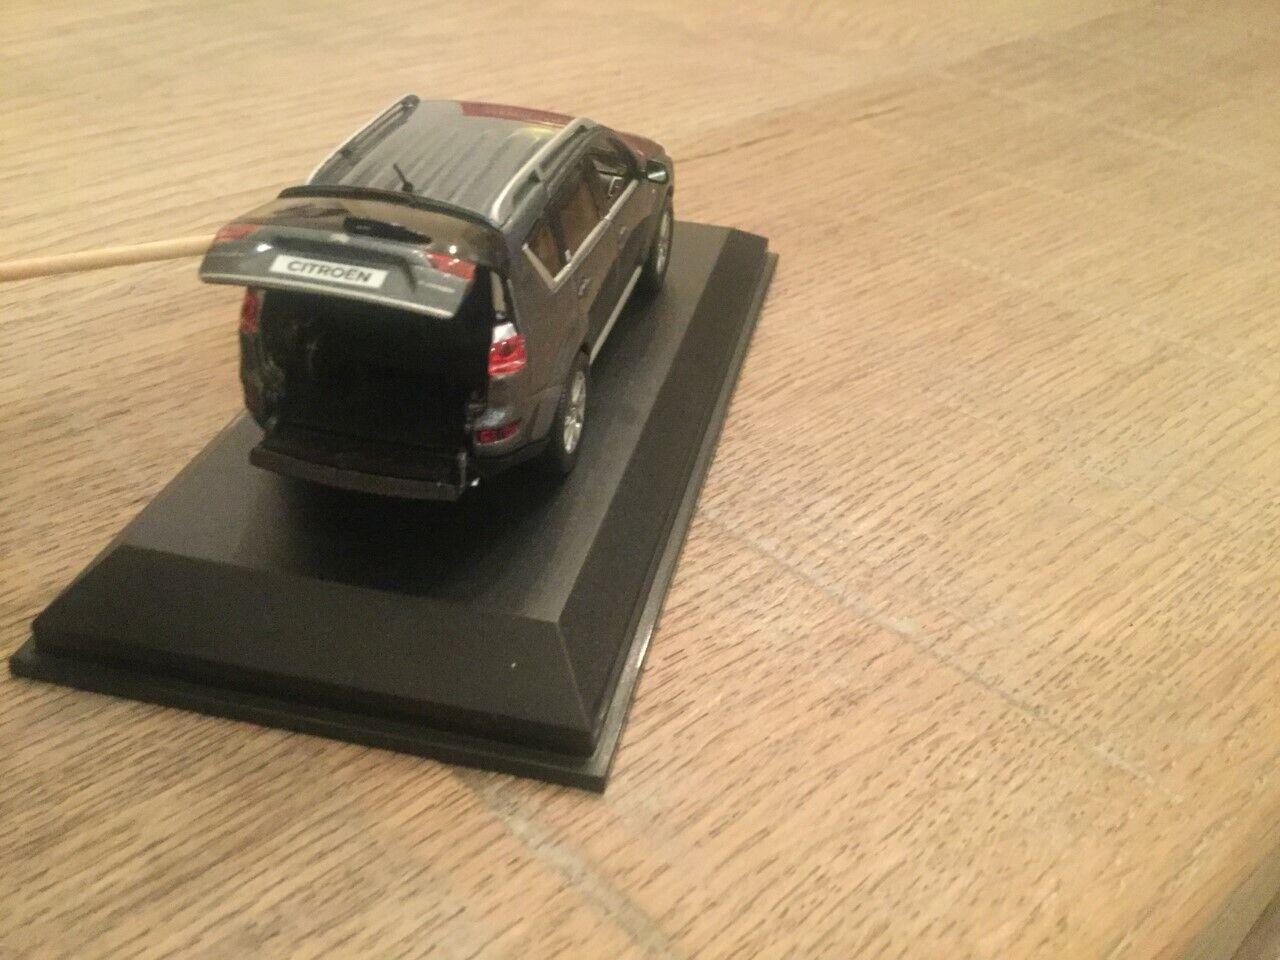 Norev 1 43 43 43 Citroën C.Crosser grey dealer edition n°AMC 018 880 6fb0e4